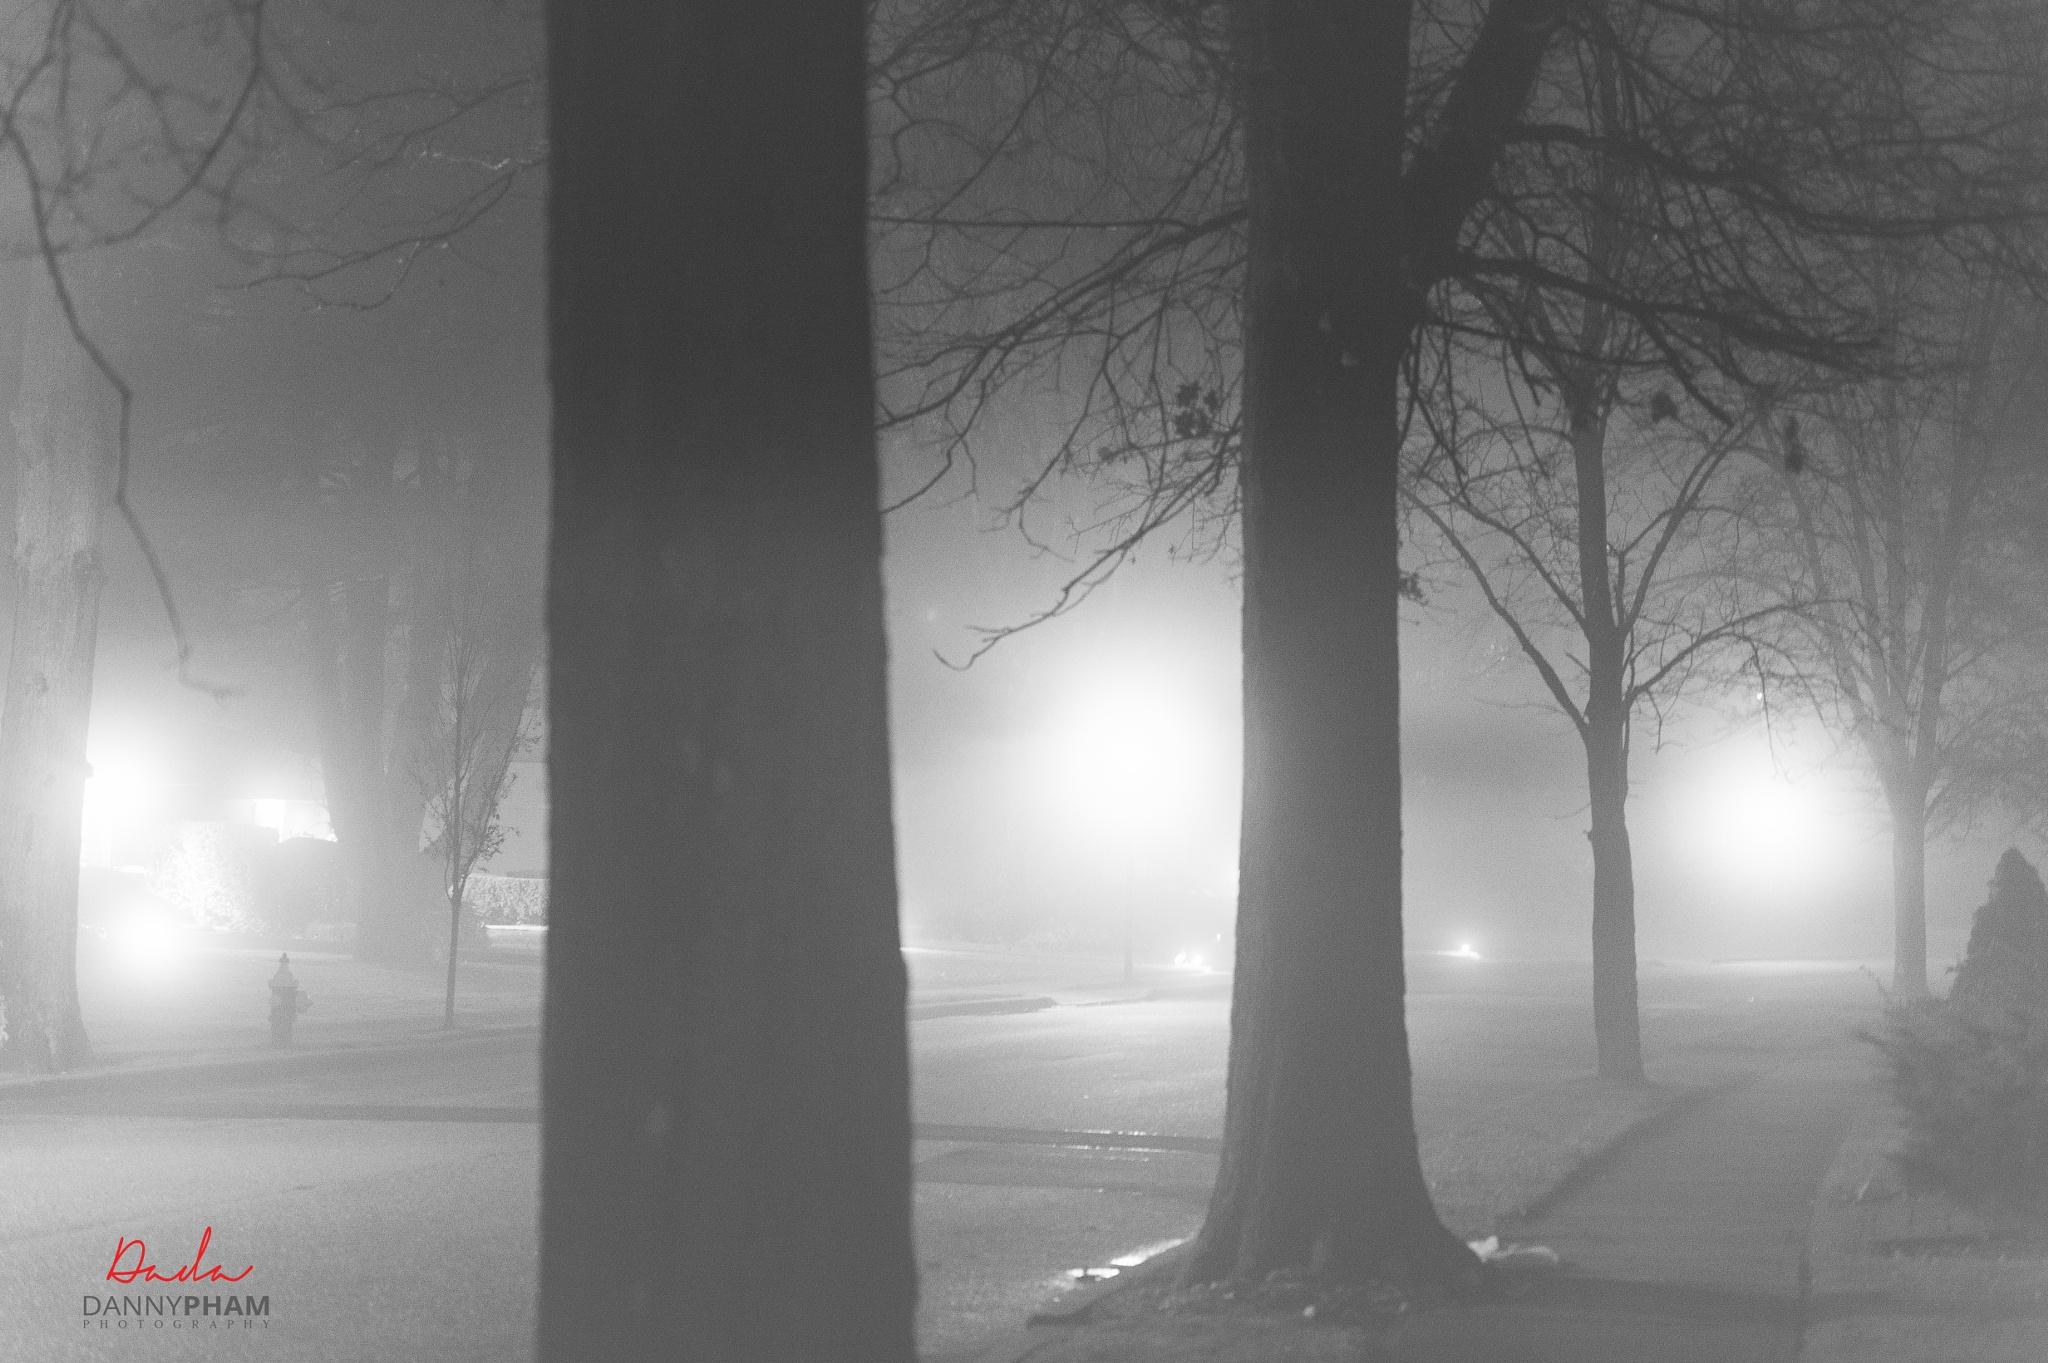 Foggy cold night by Danny Pham